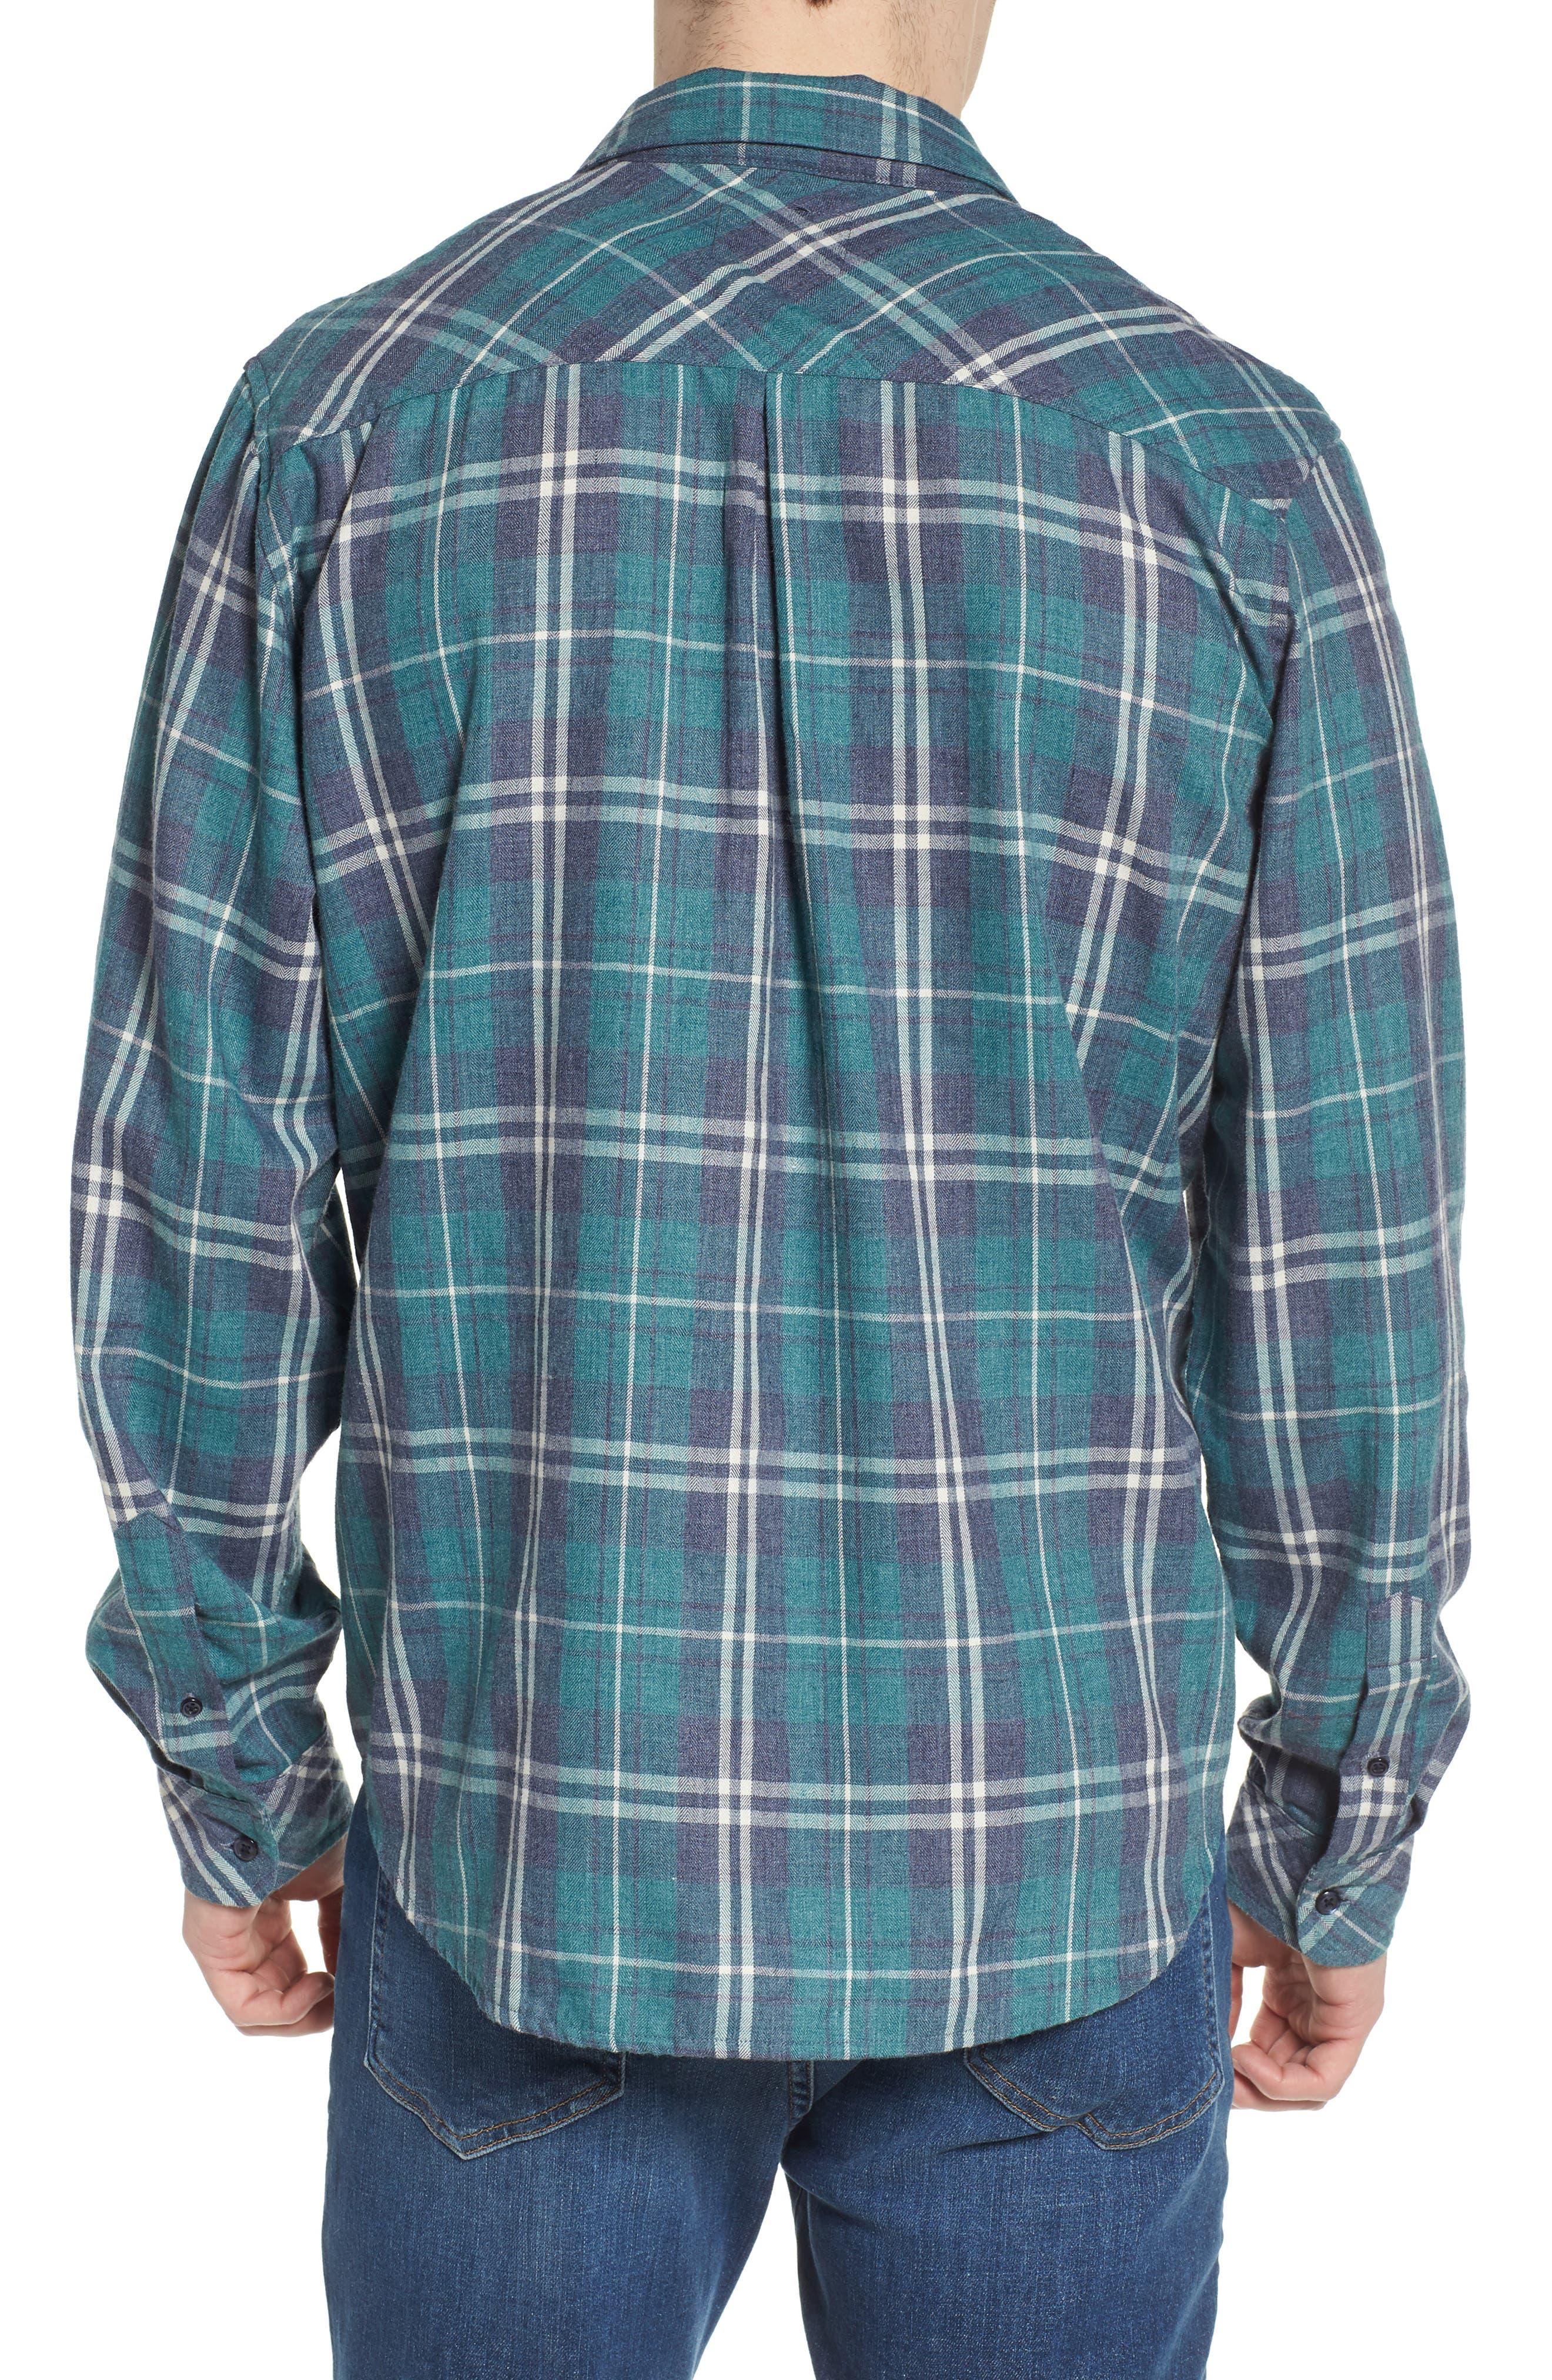 Lennox Slim Fit Plaid Woven Shirt,                             Alternate thumbnail 2, color,                             Veridian Navy White